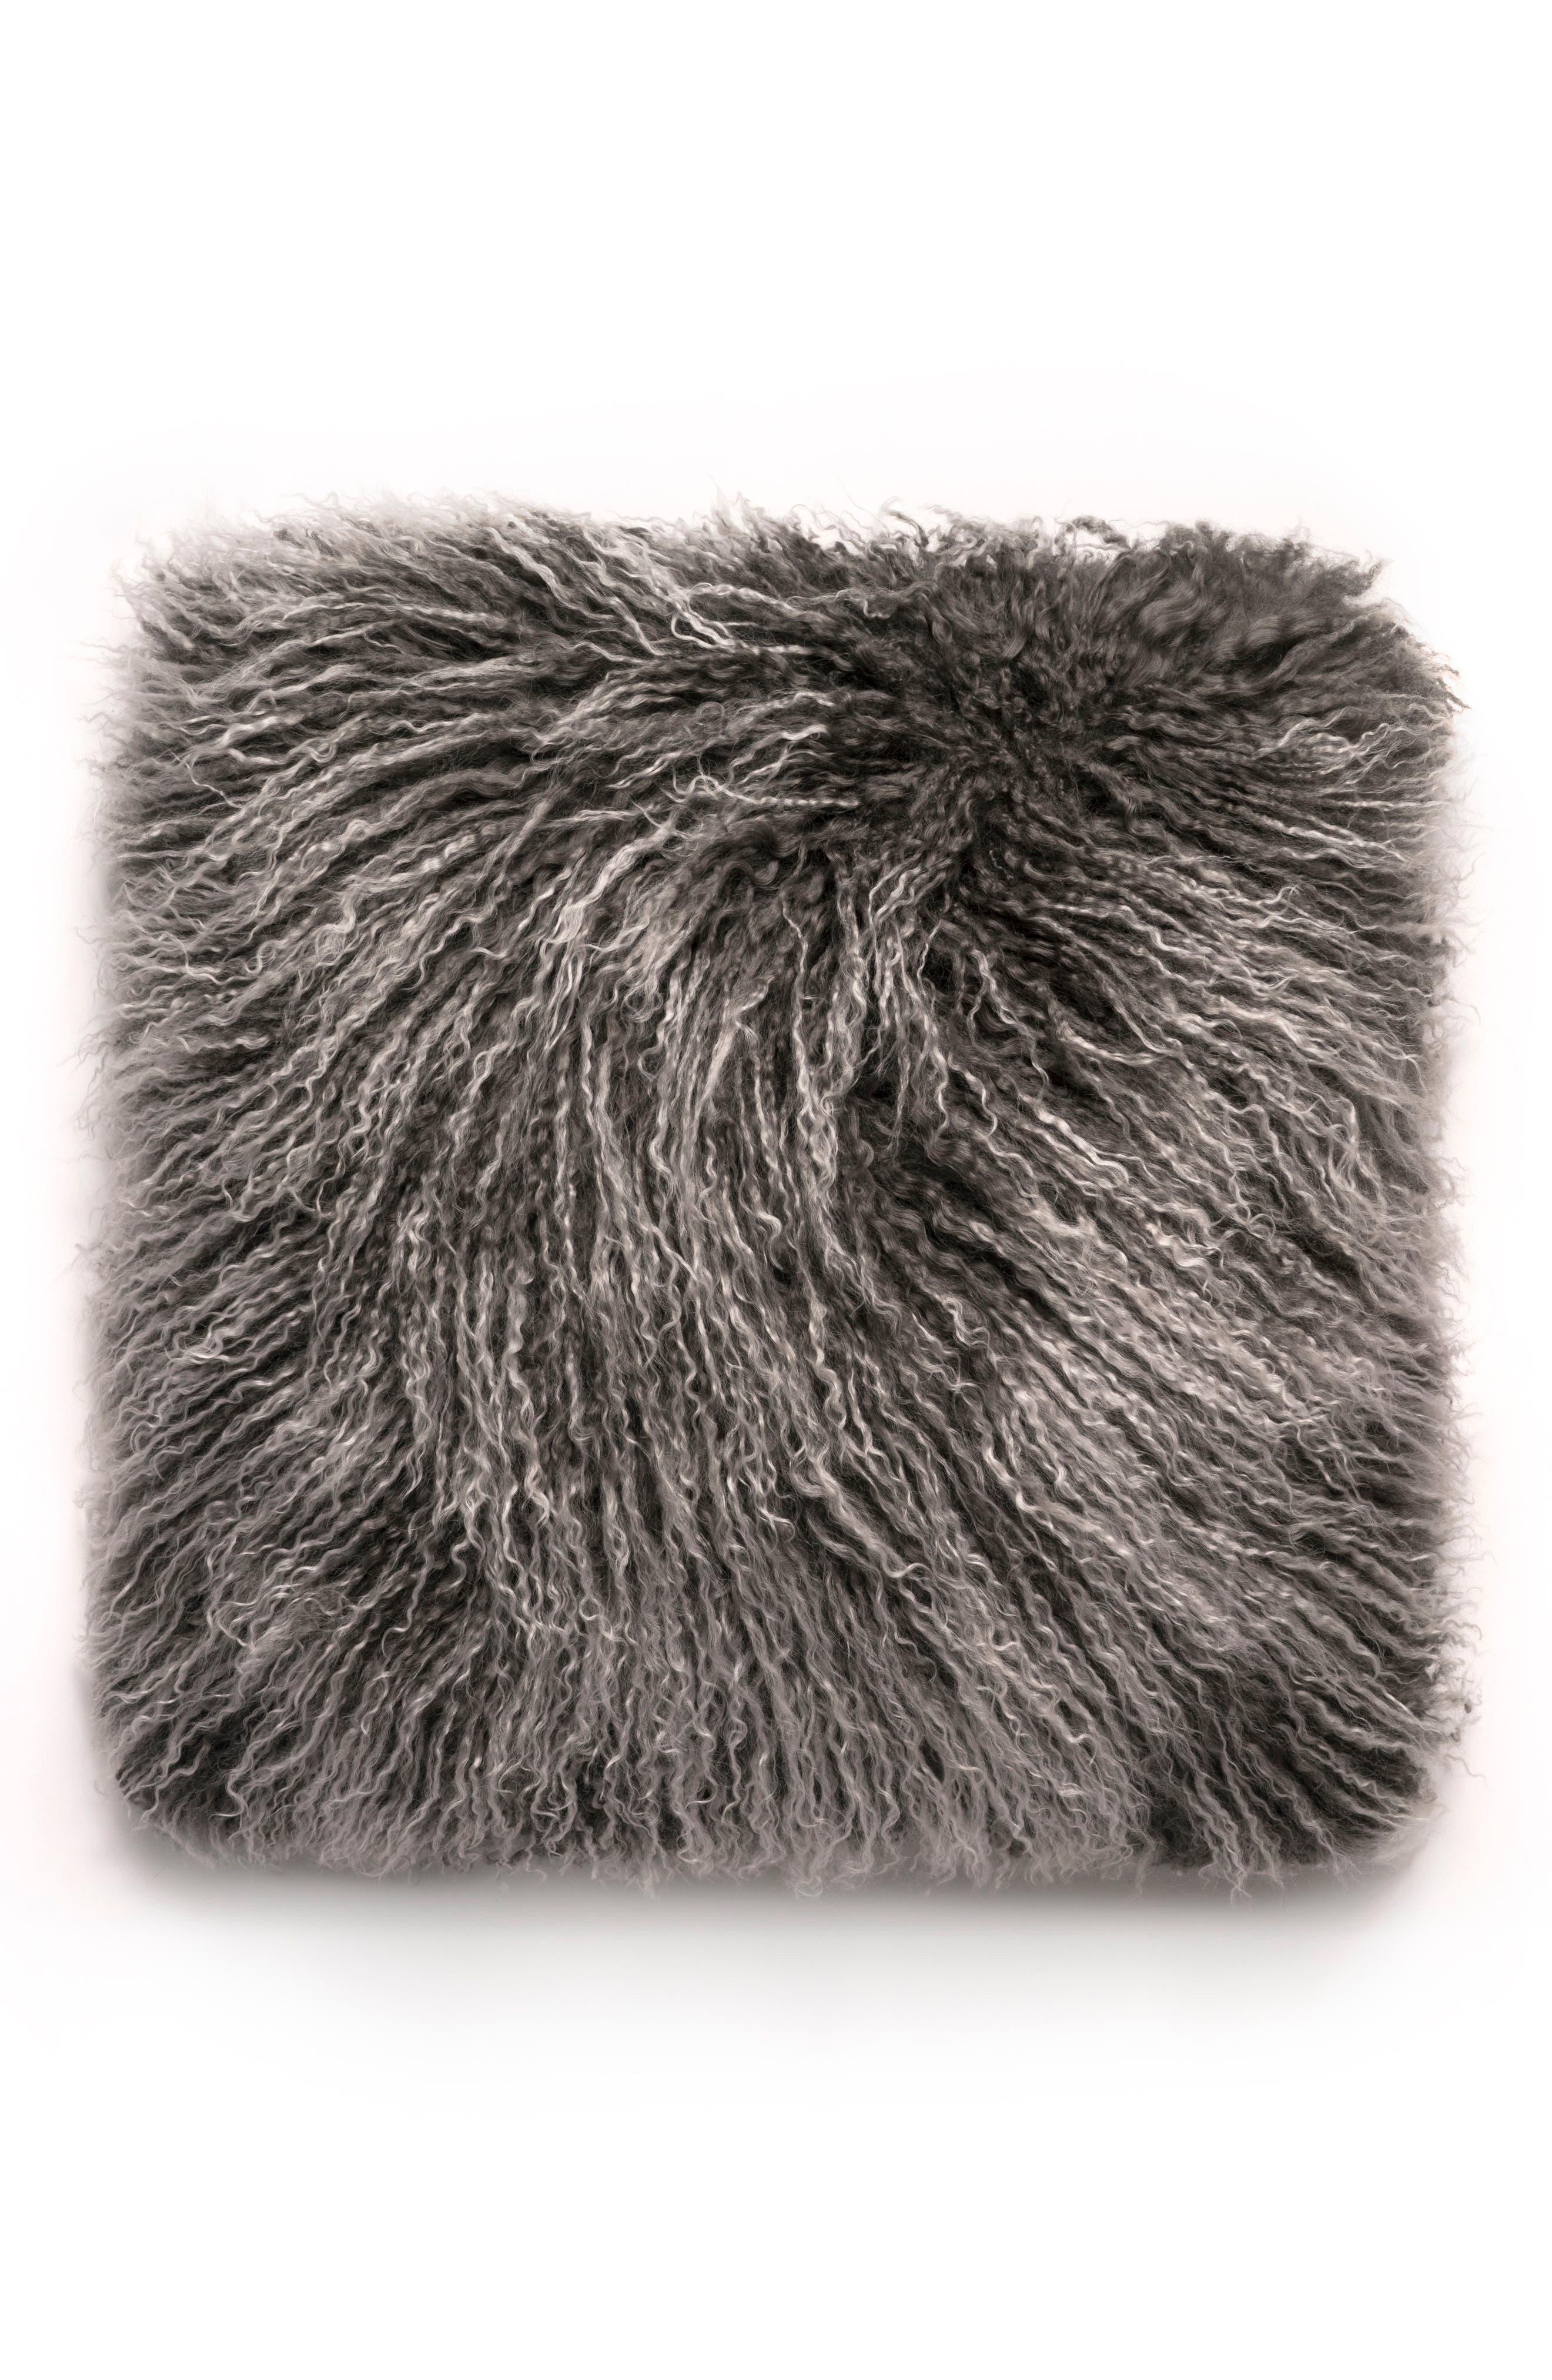 Genuine Mongolian Sheepskin Accent Pillow,                             Main thumbnail 1, color,                             020